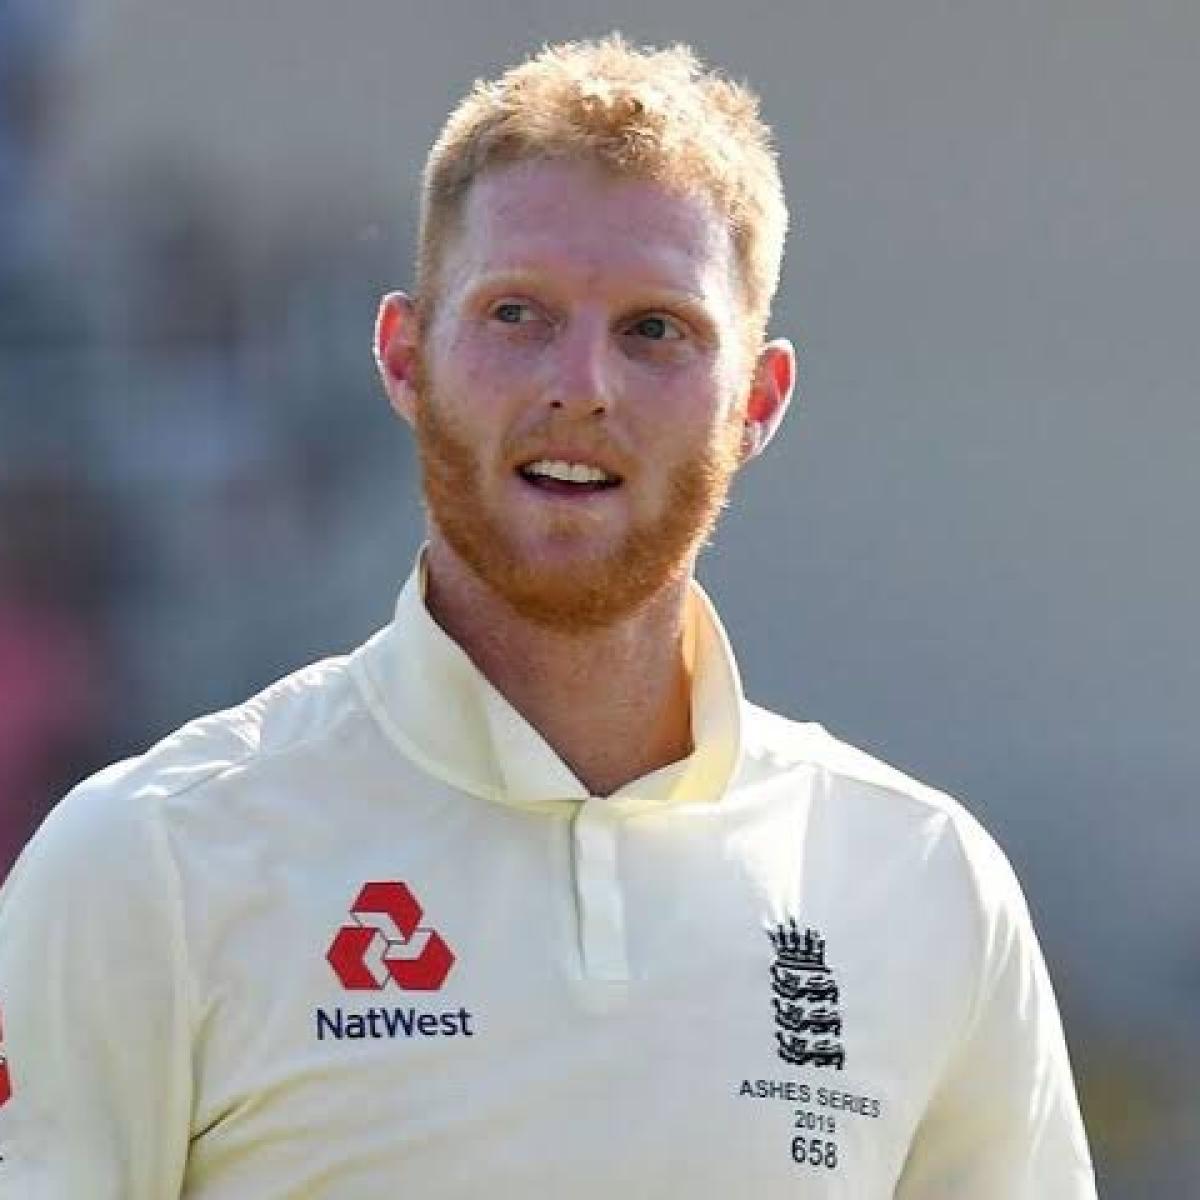 England cricketer Ben Stokes honoured with OBE award